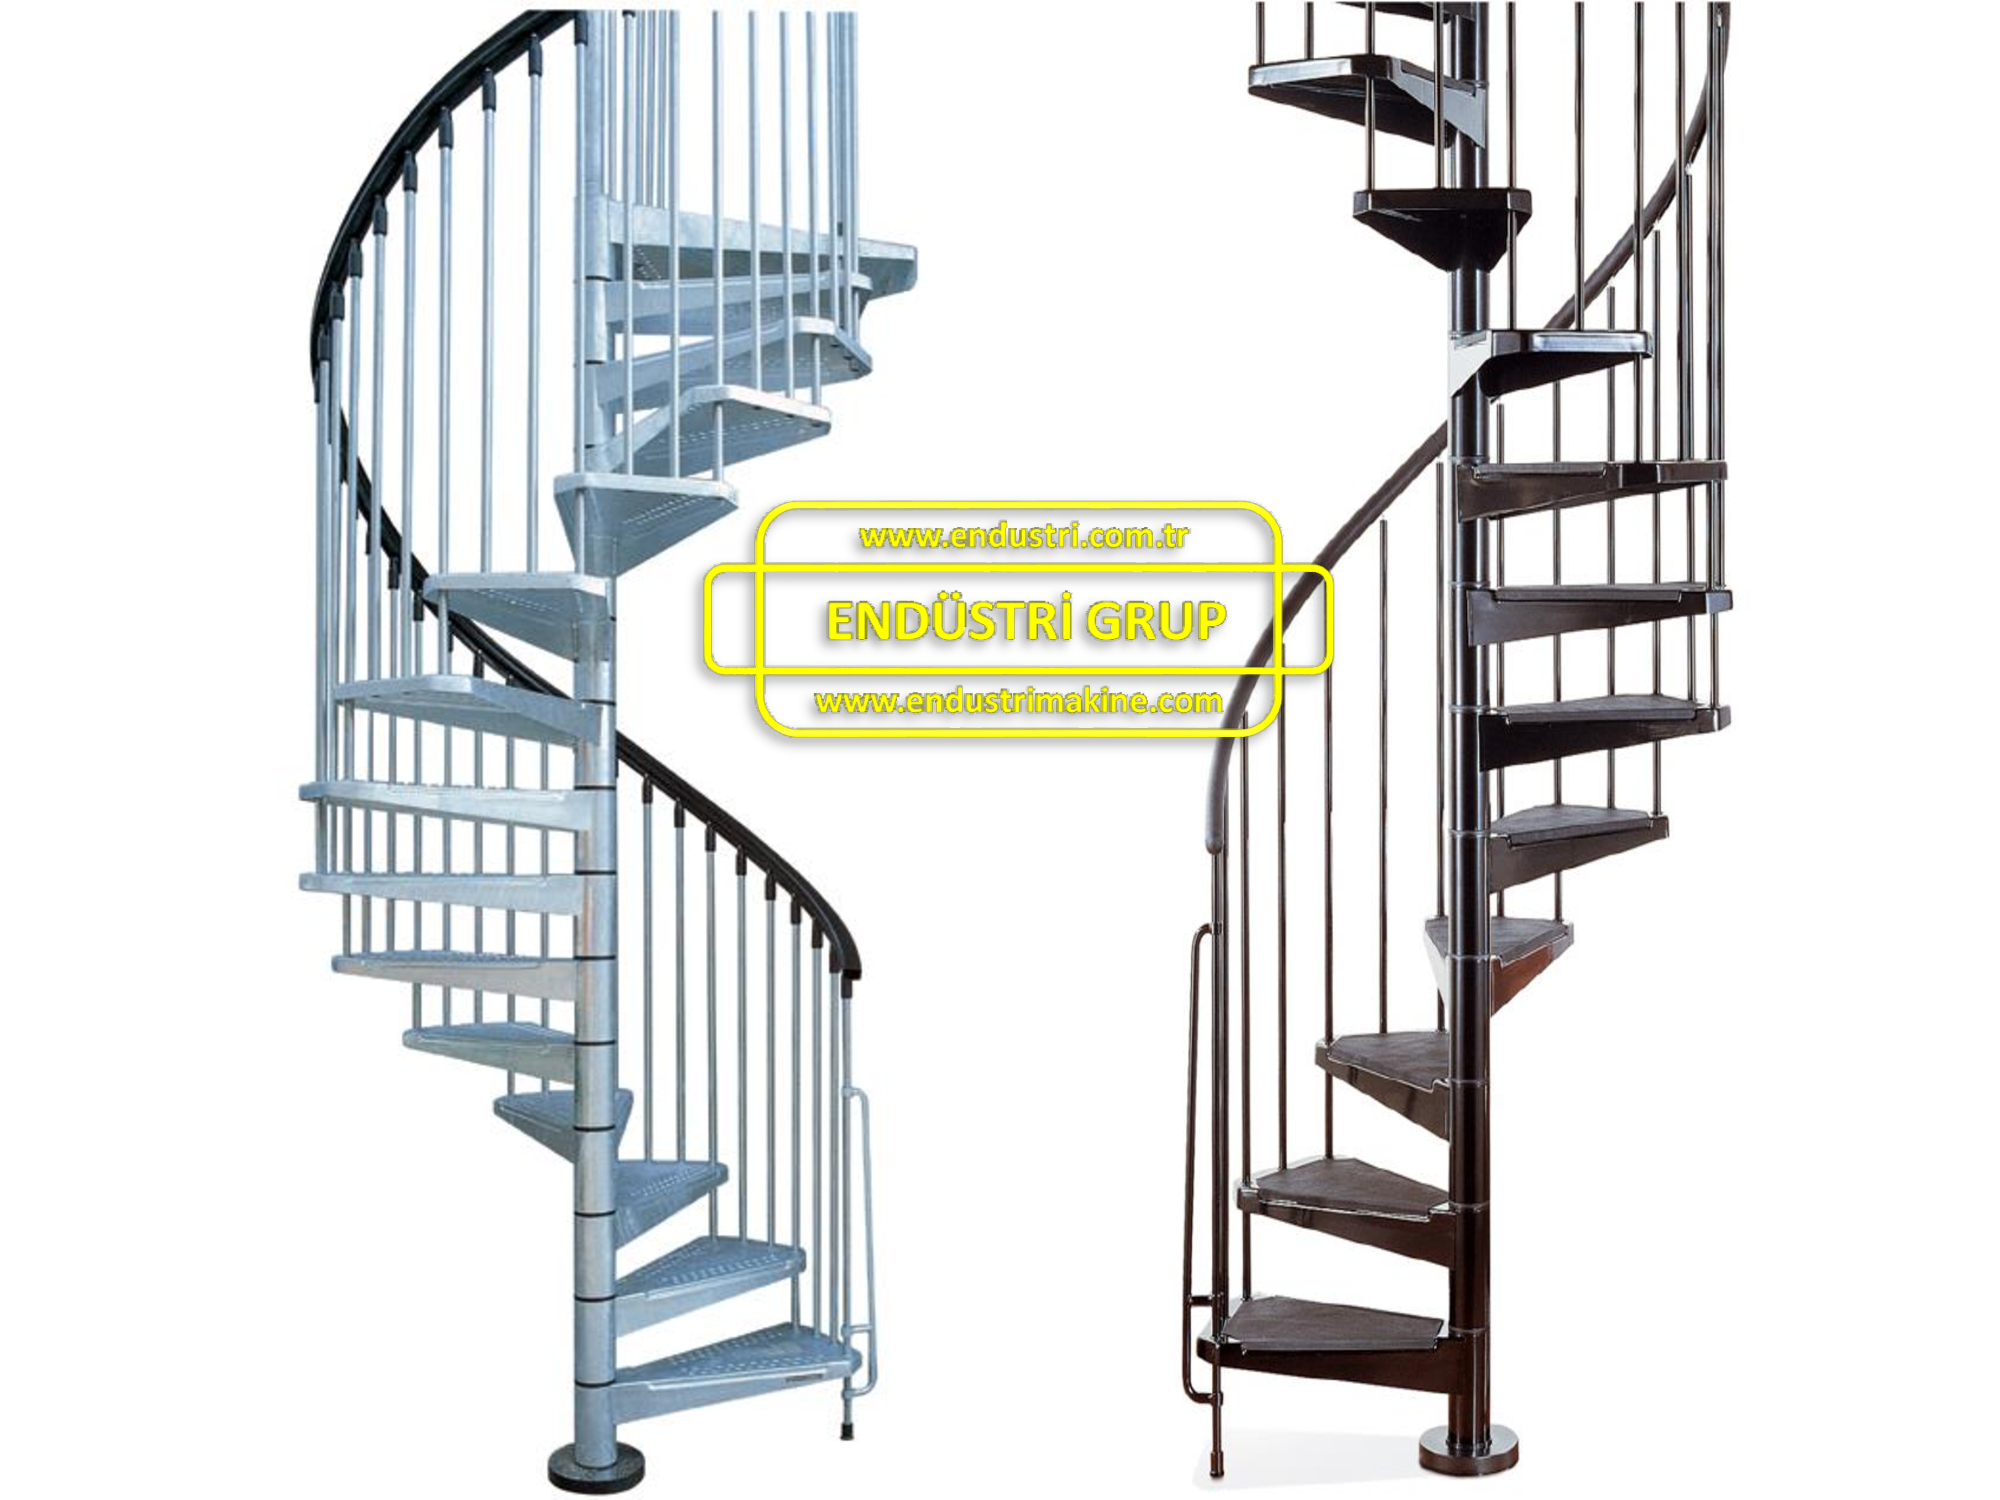 omurgali-helezon-spiral-celik-merdiven-fiyati-modelleri